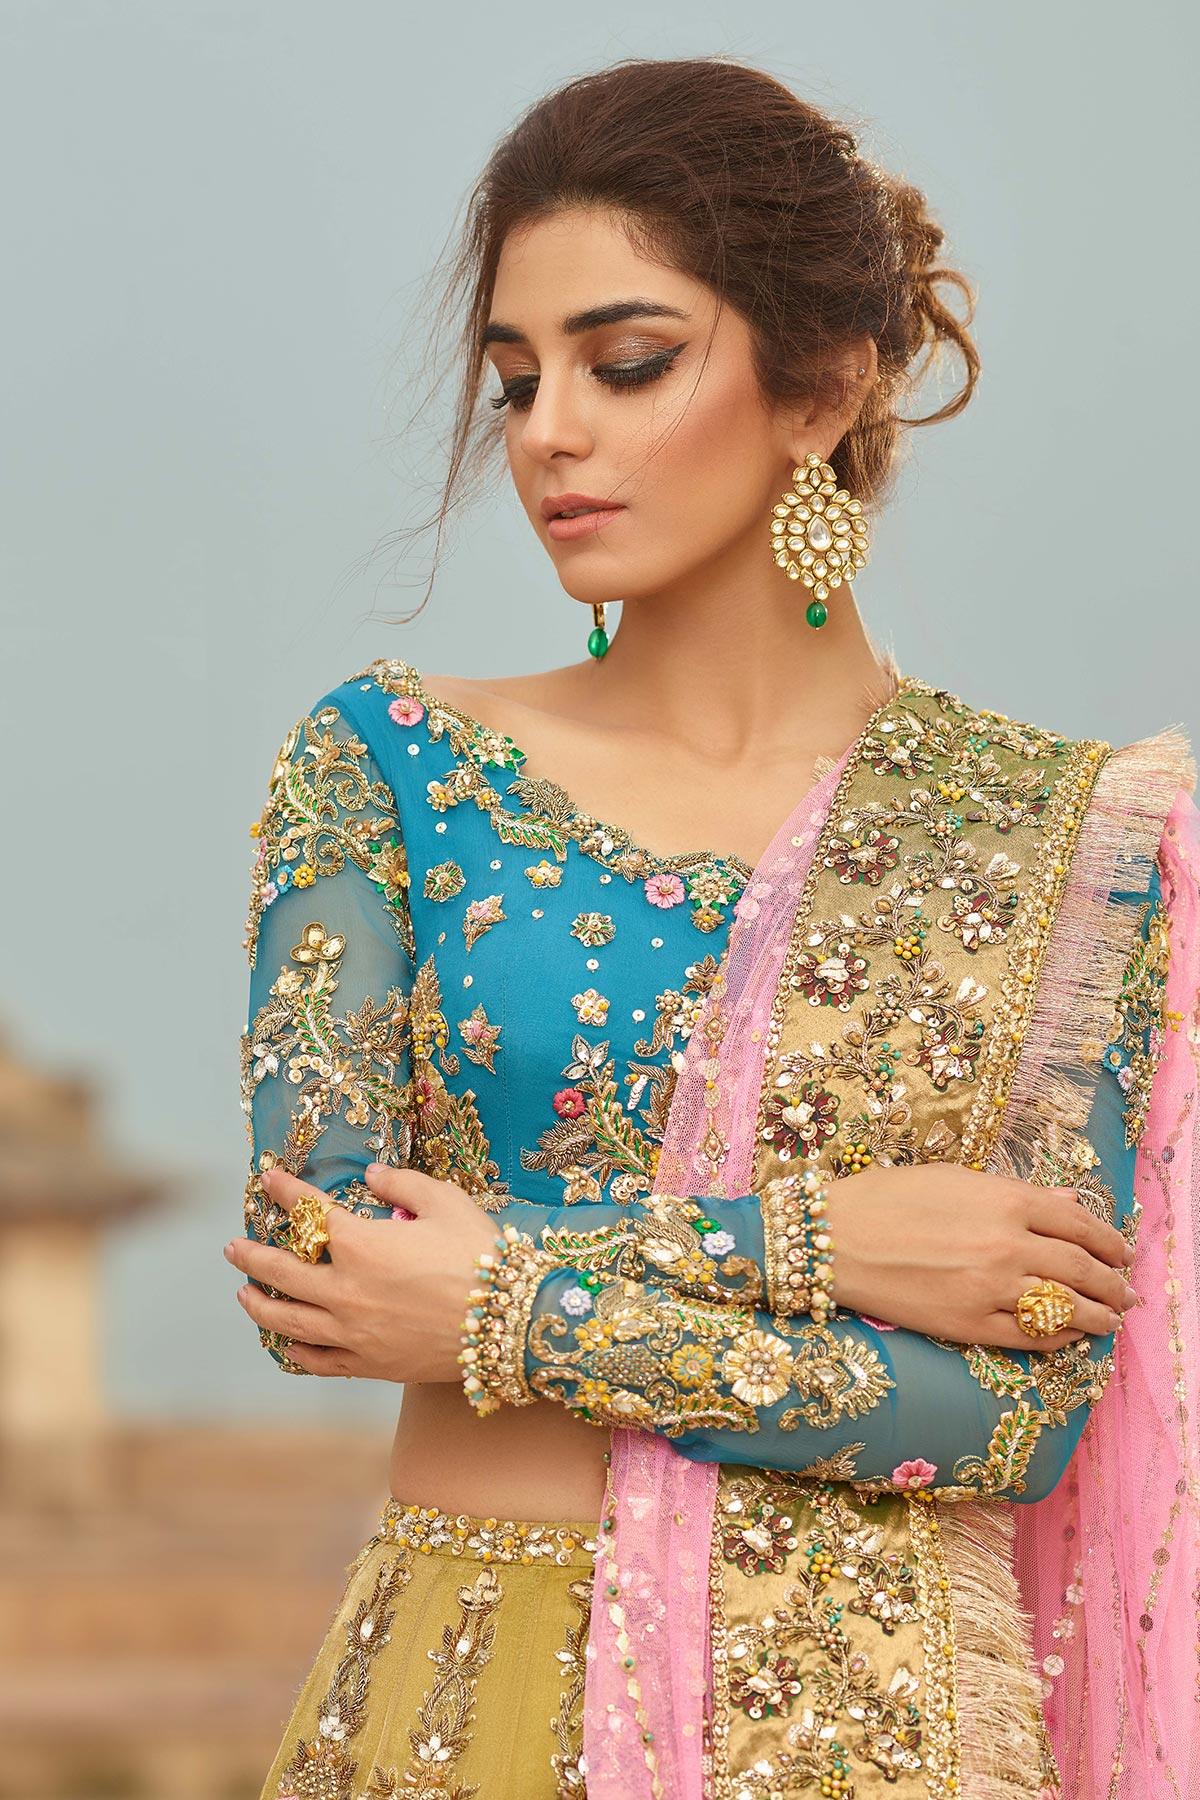 SHEHNAI GULBAHAR BRIDAL #PanteneHumBridalCoutureWeek - chambeili Bridal